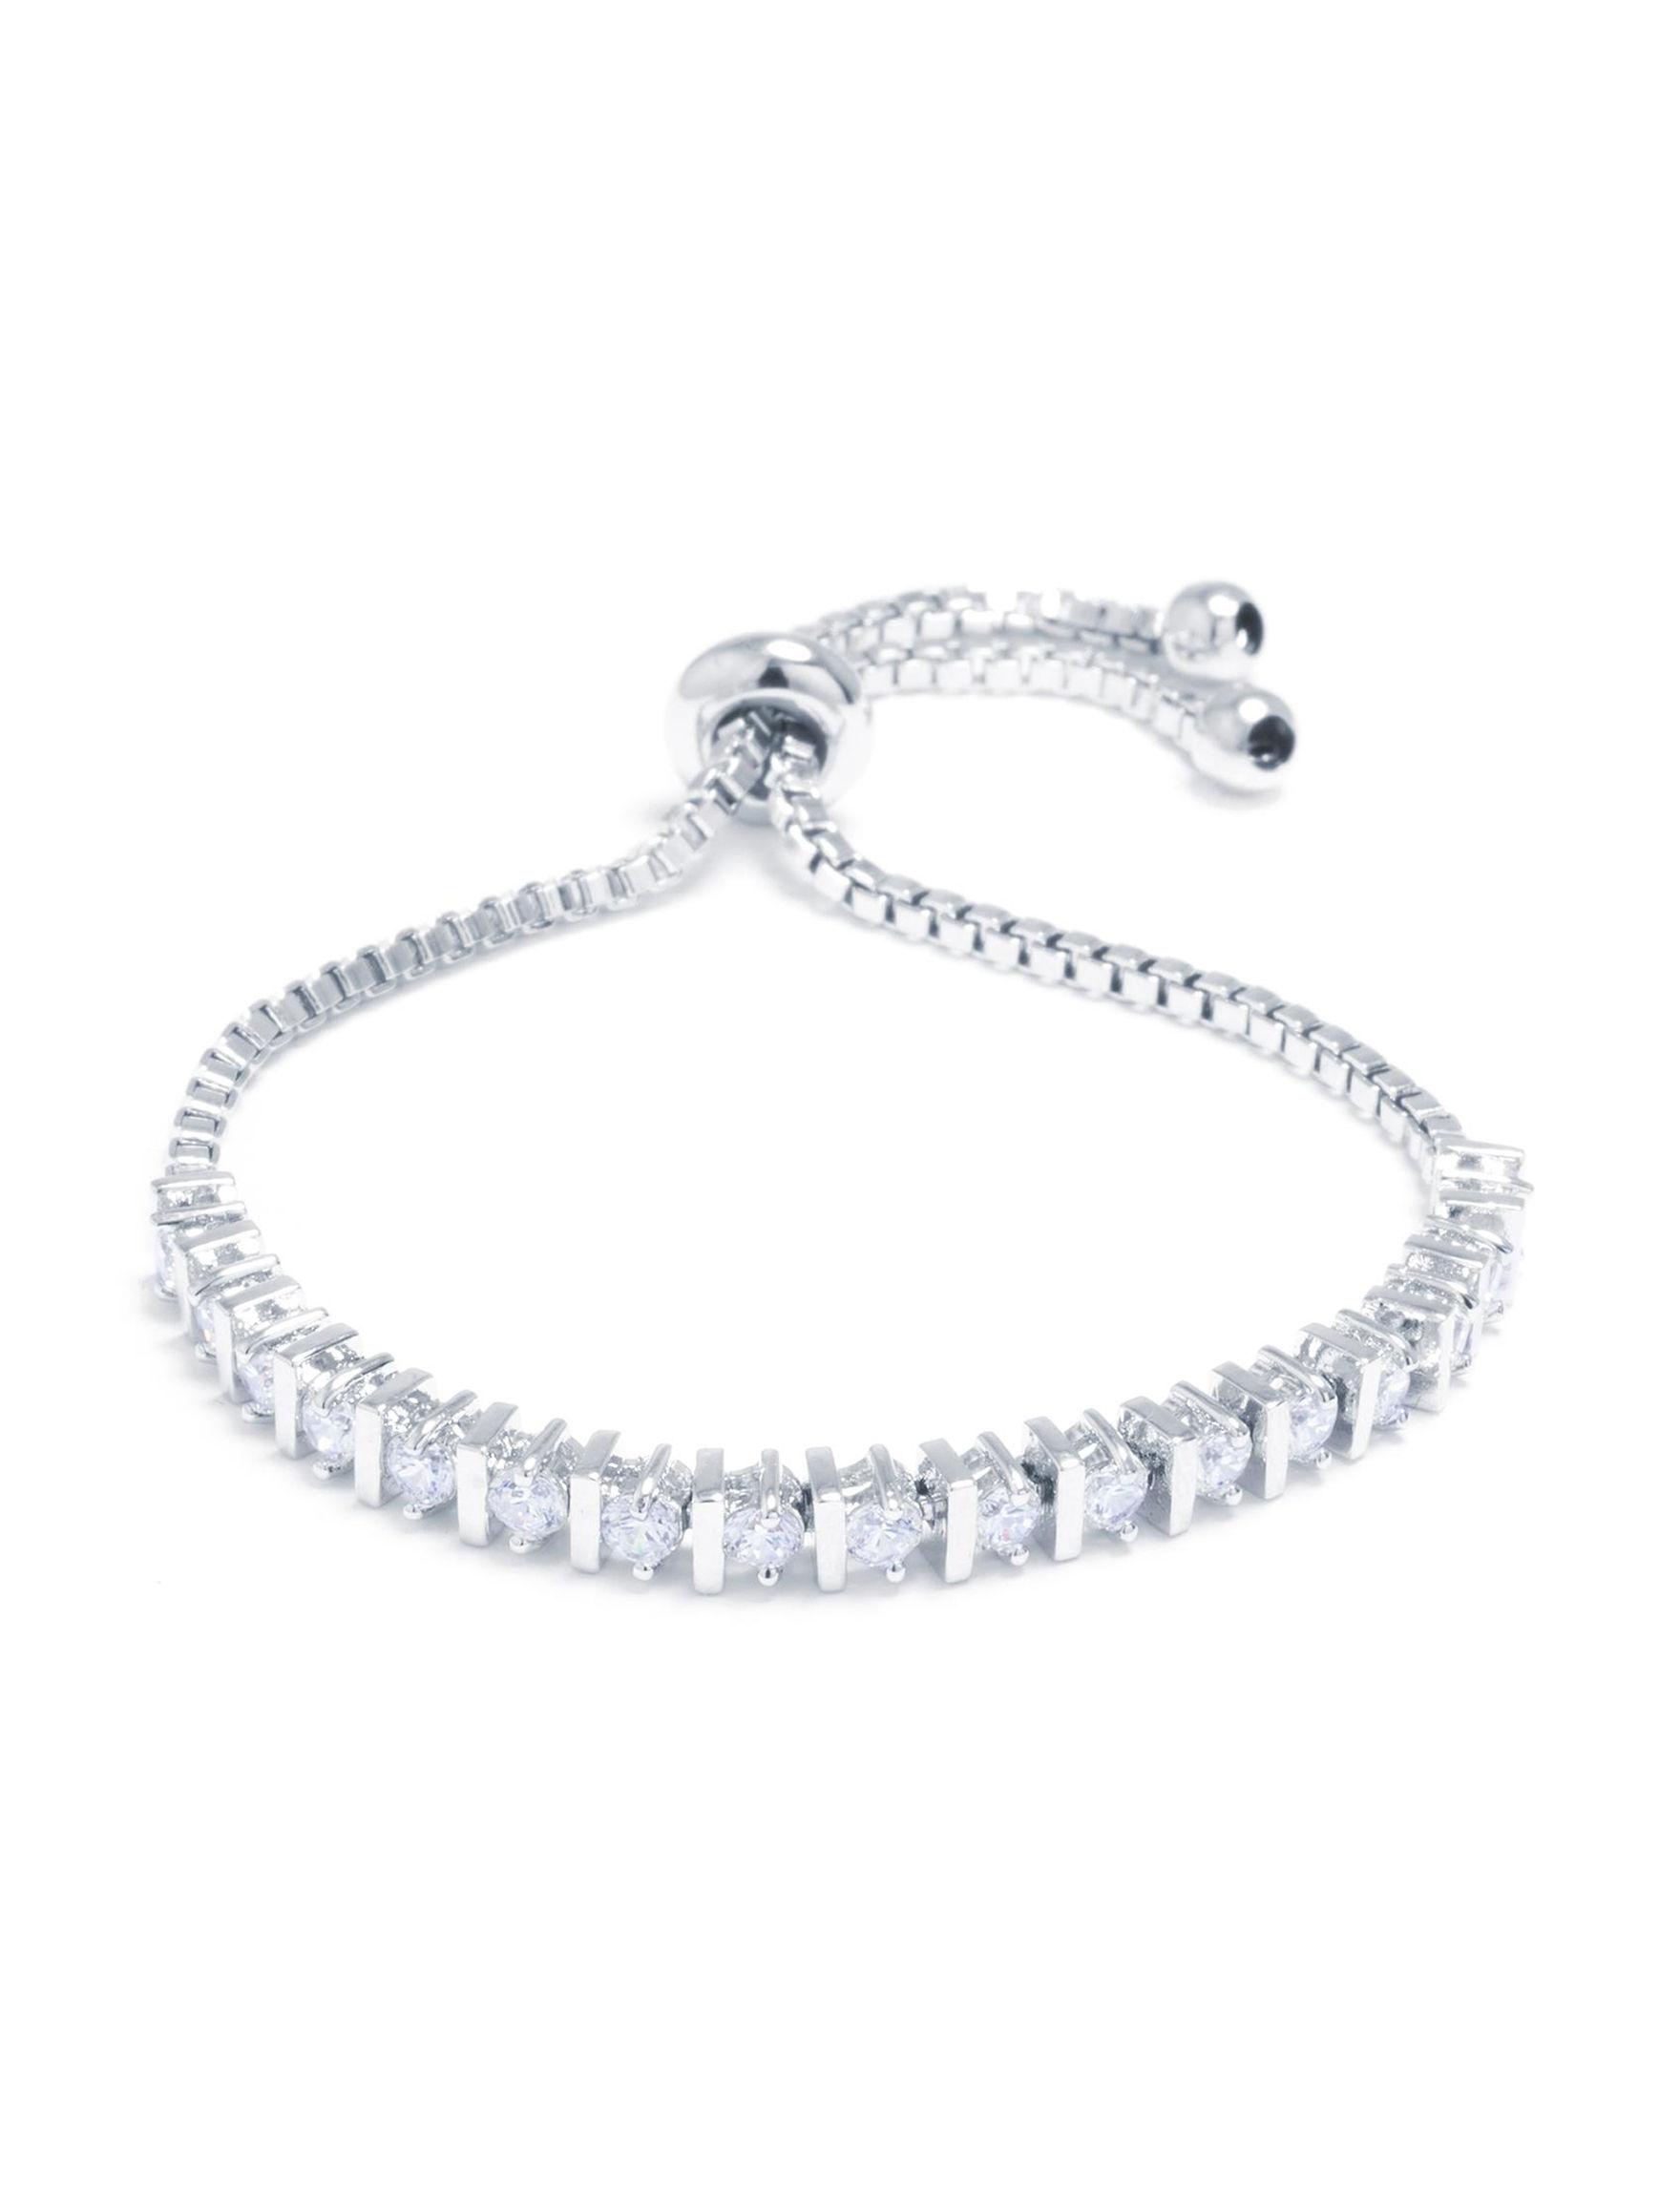 Athra Fine Silver Plated Bracelets Fine Jewelry